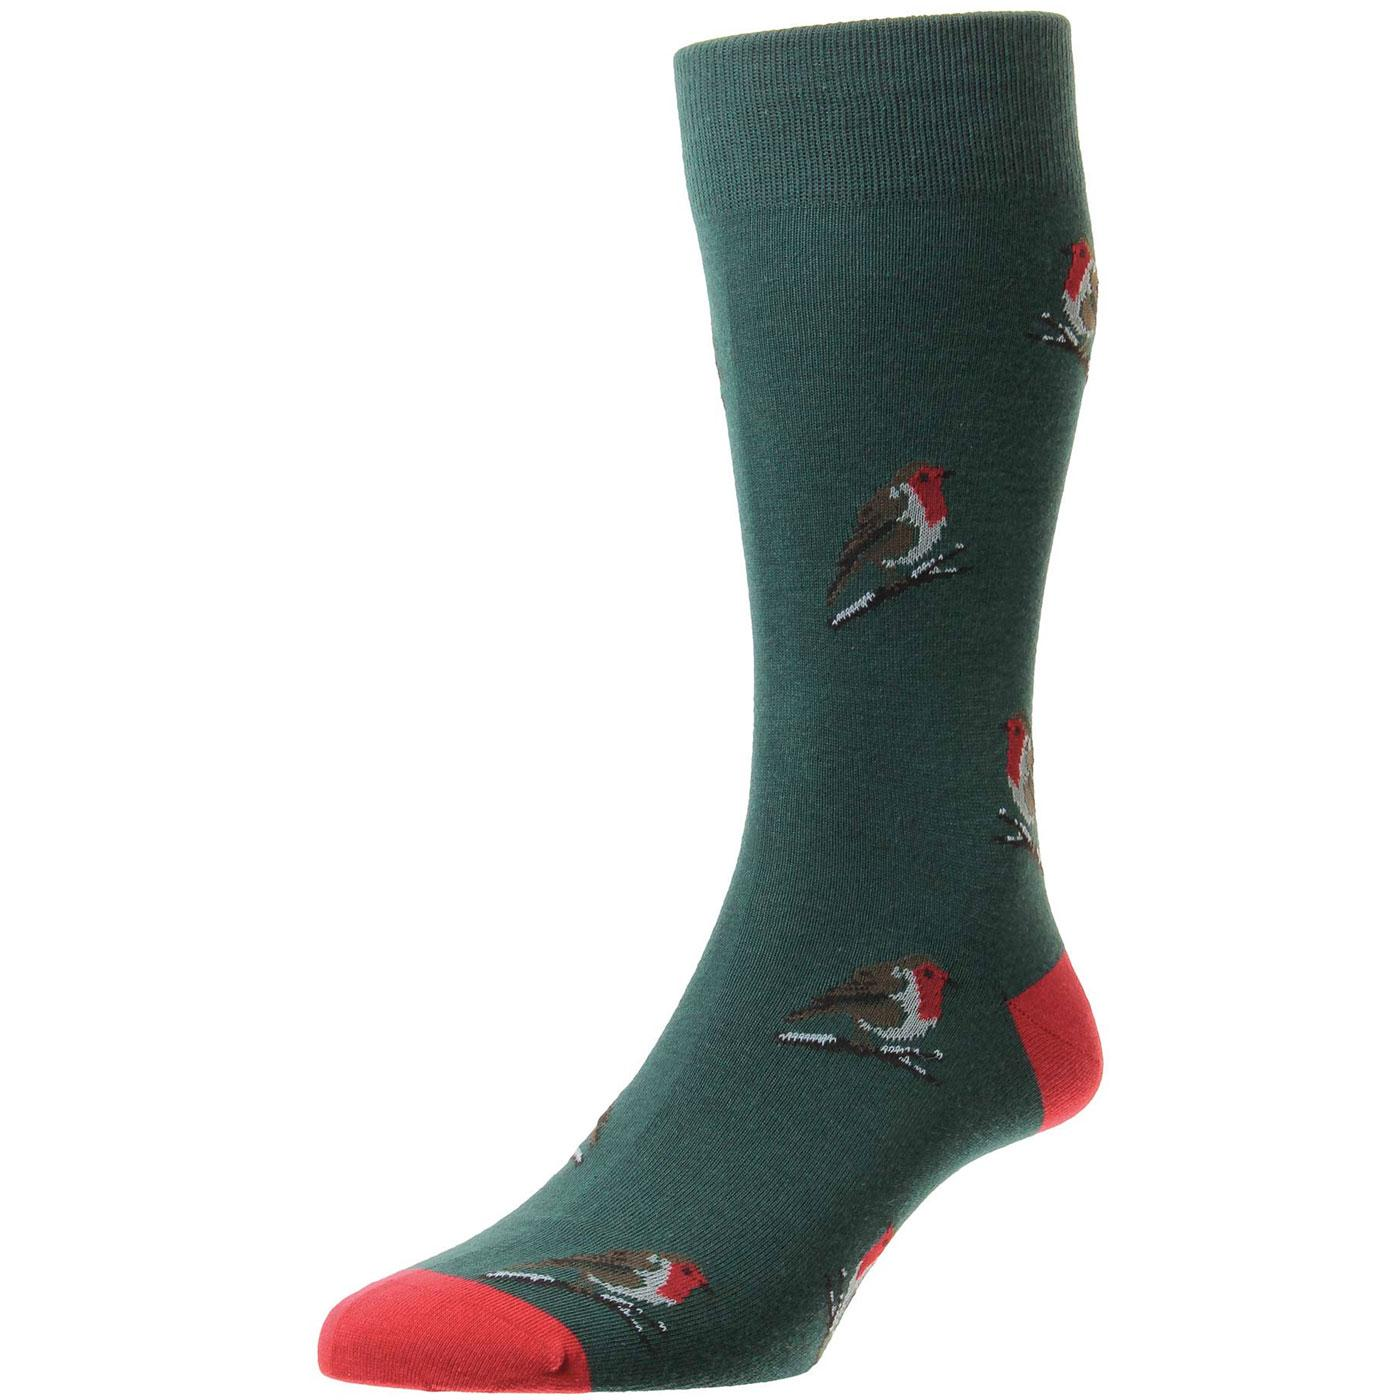 + Wray Robins SCOTT-NICHOL Retro Men's Socks